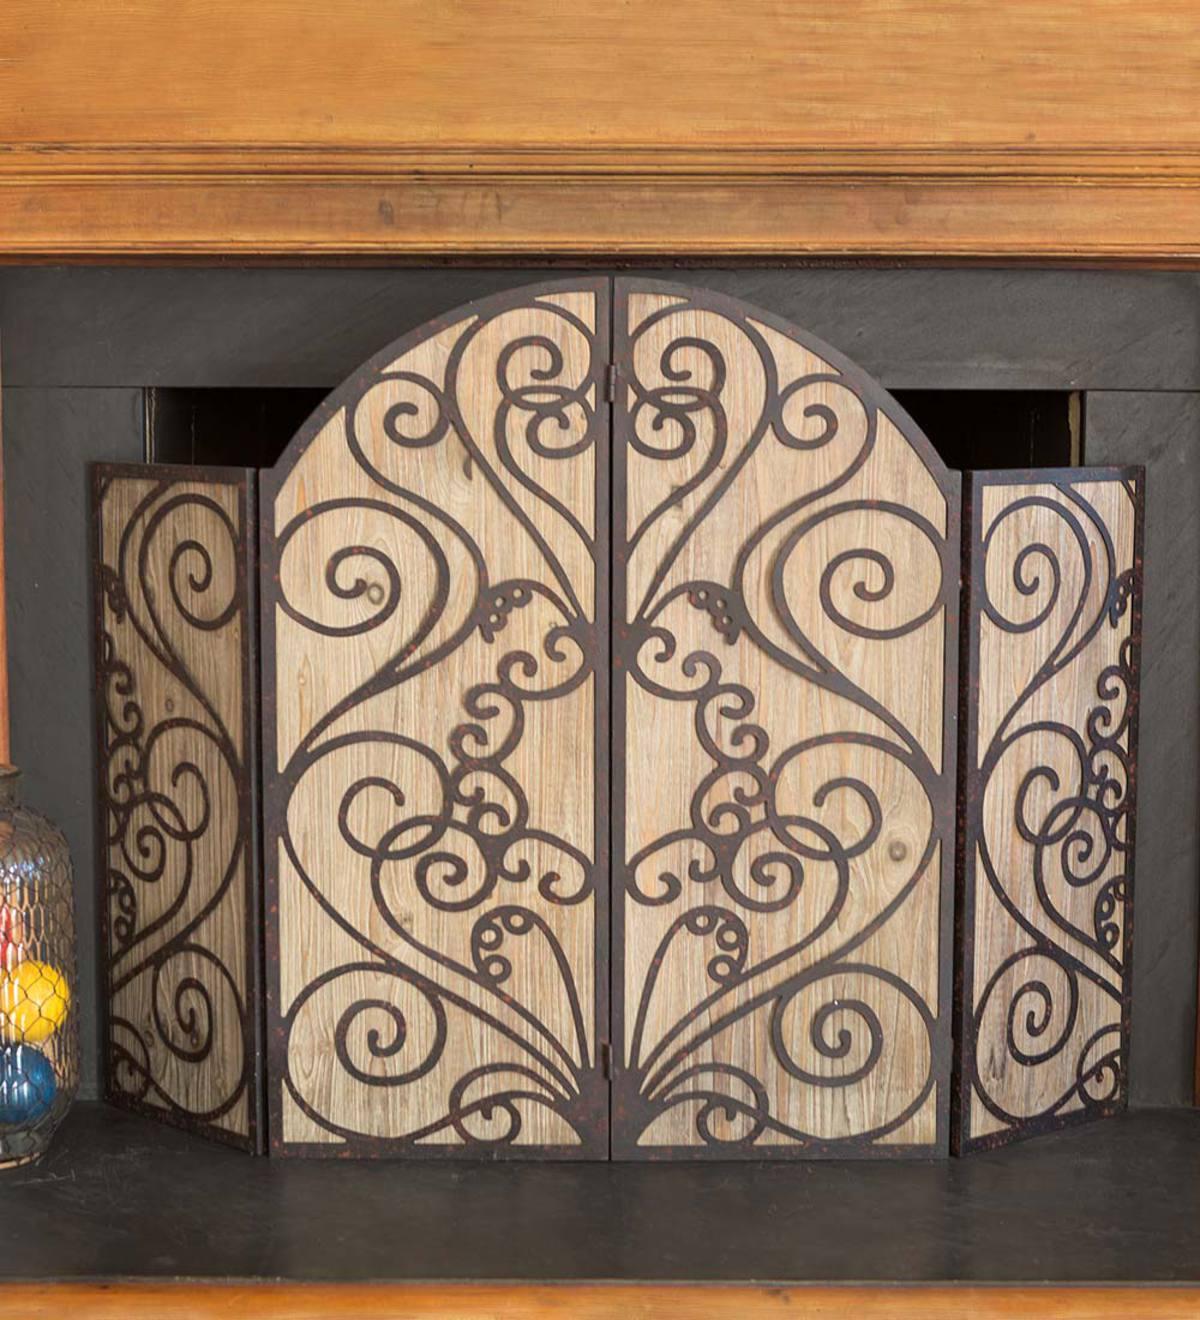 Garden Gate Decorative Fireplace Screen | PlowHearth